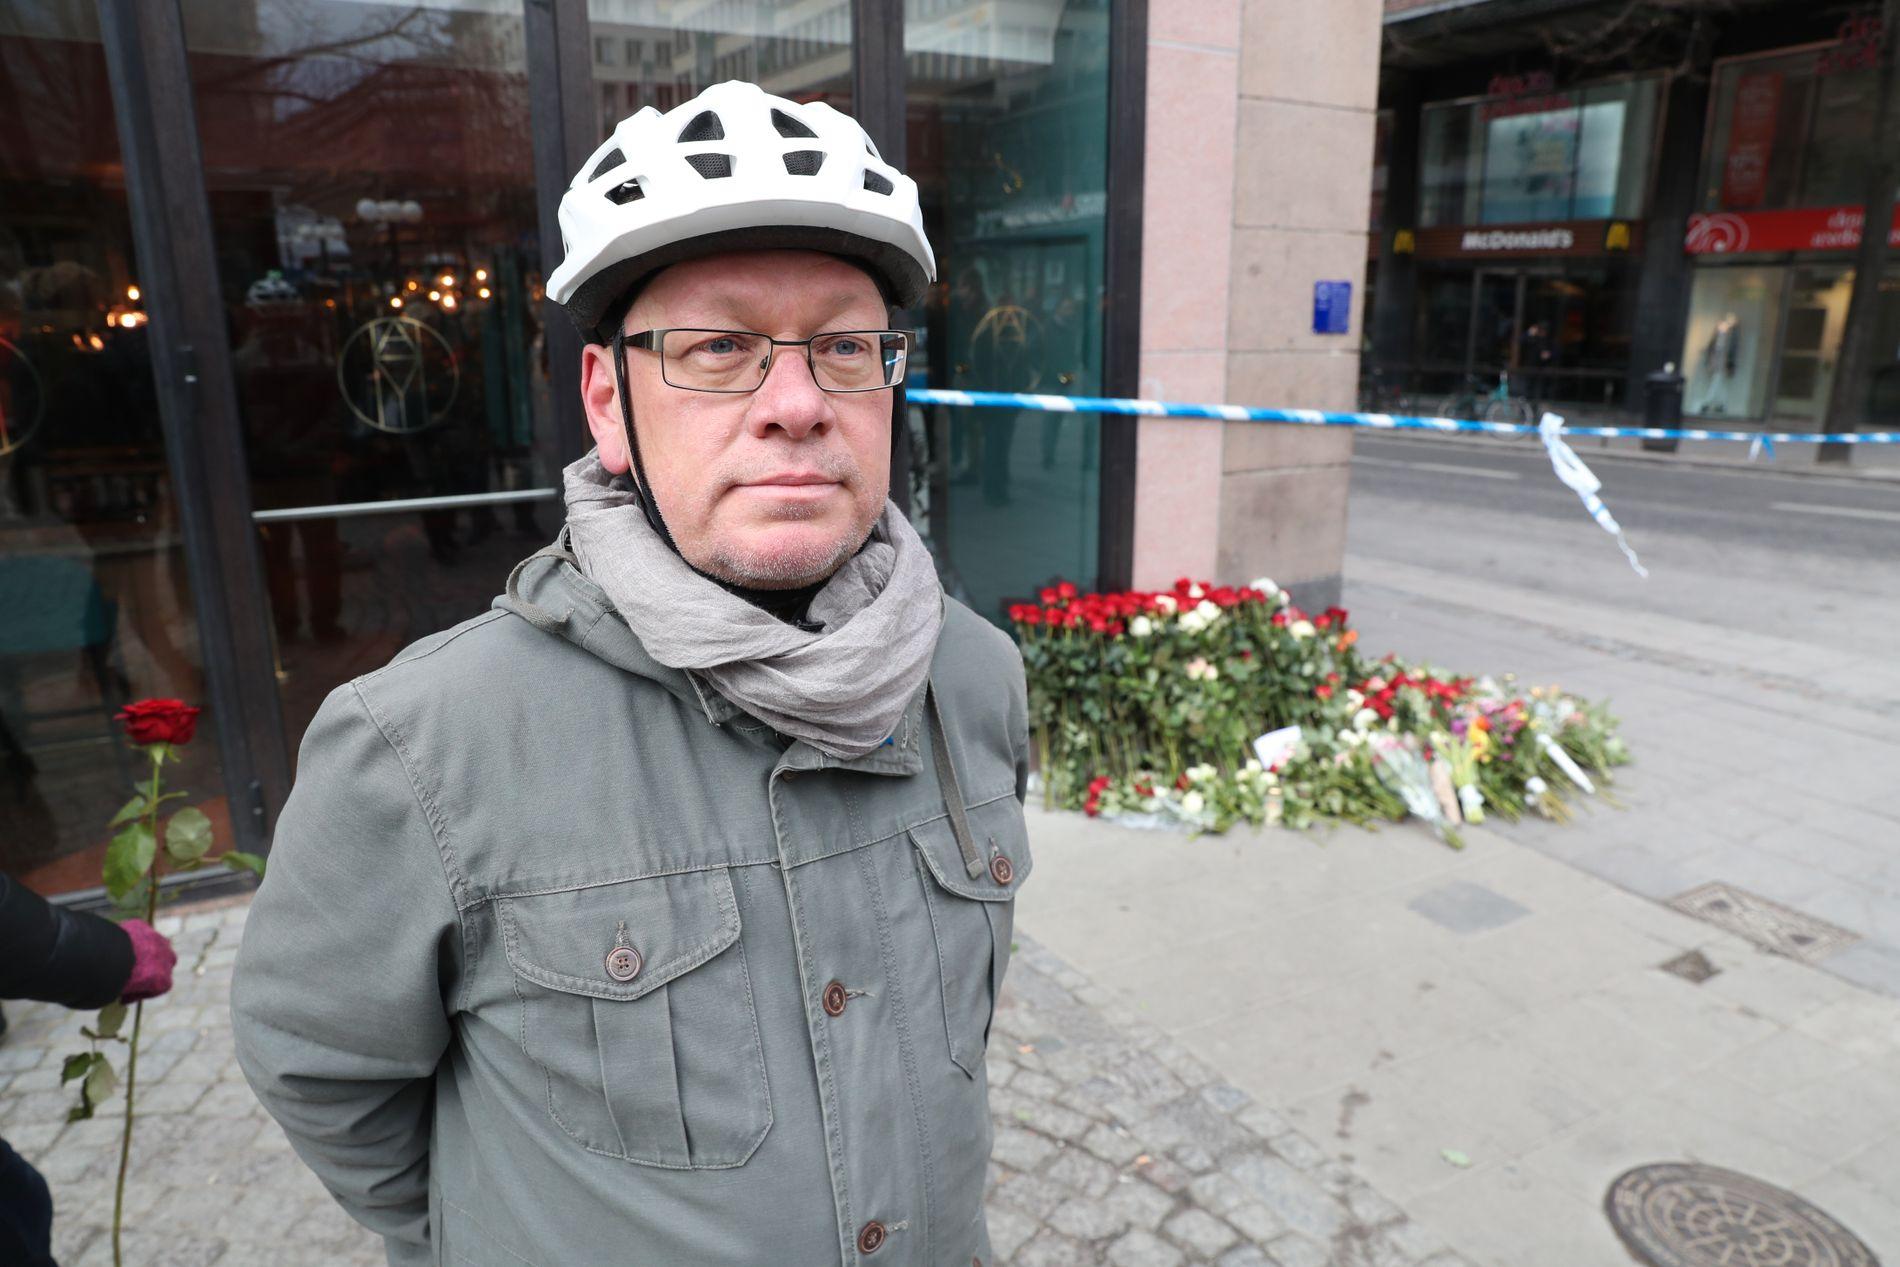 BEVEGET: Thomas Hofman (54) er i Stockholm sentrum for hedre terrorofrene. Foto: HALLGEIR VÅGENES